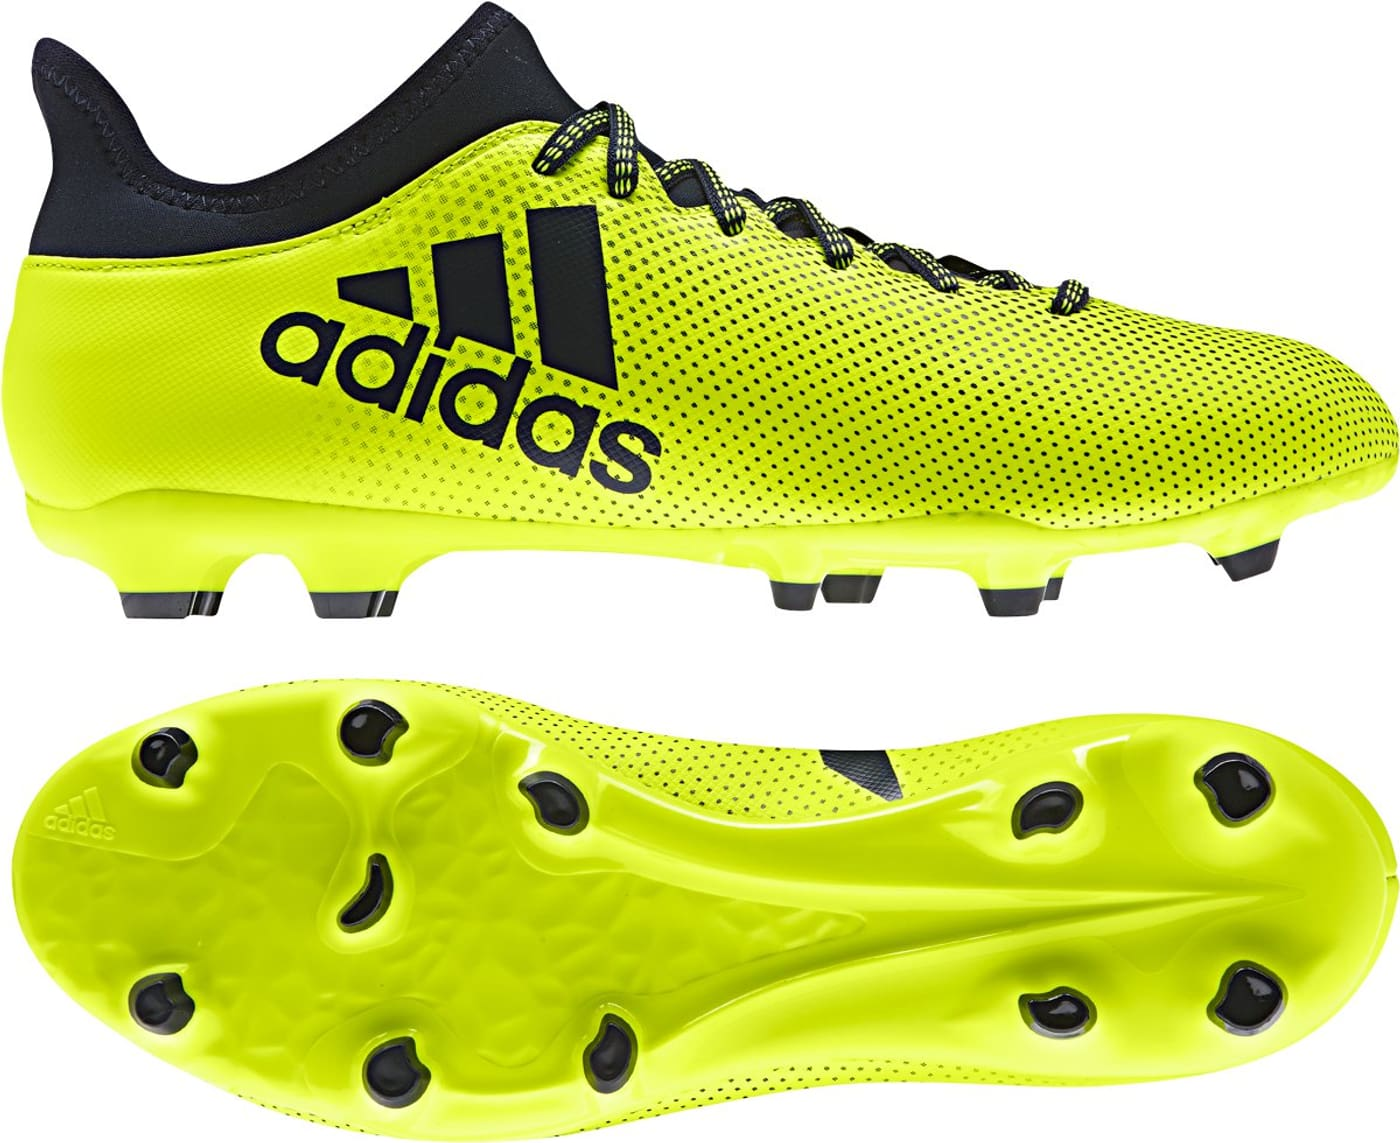 uk availability db19c 30e1b Pour Migros Homme De Football X 3 17 Fg Adidas Chaussures wv7q0zT